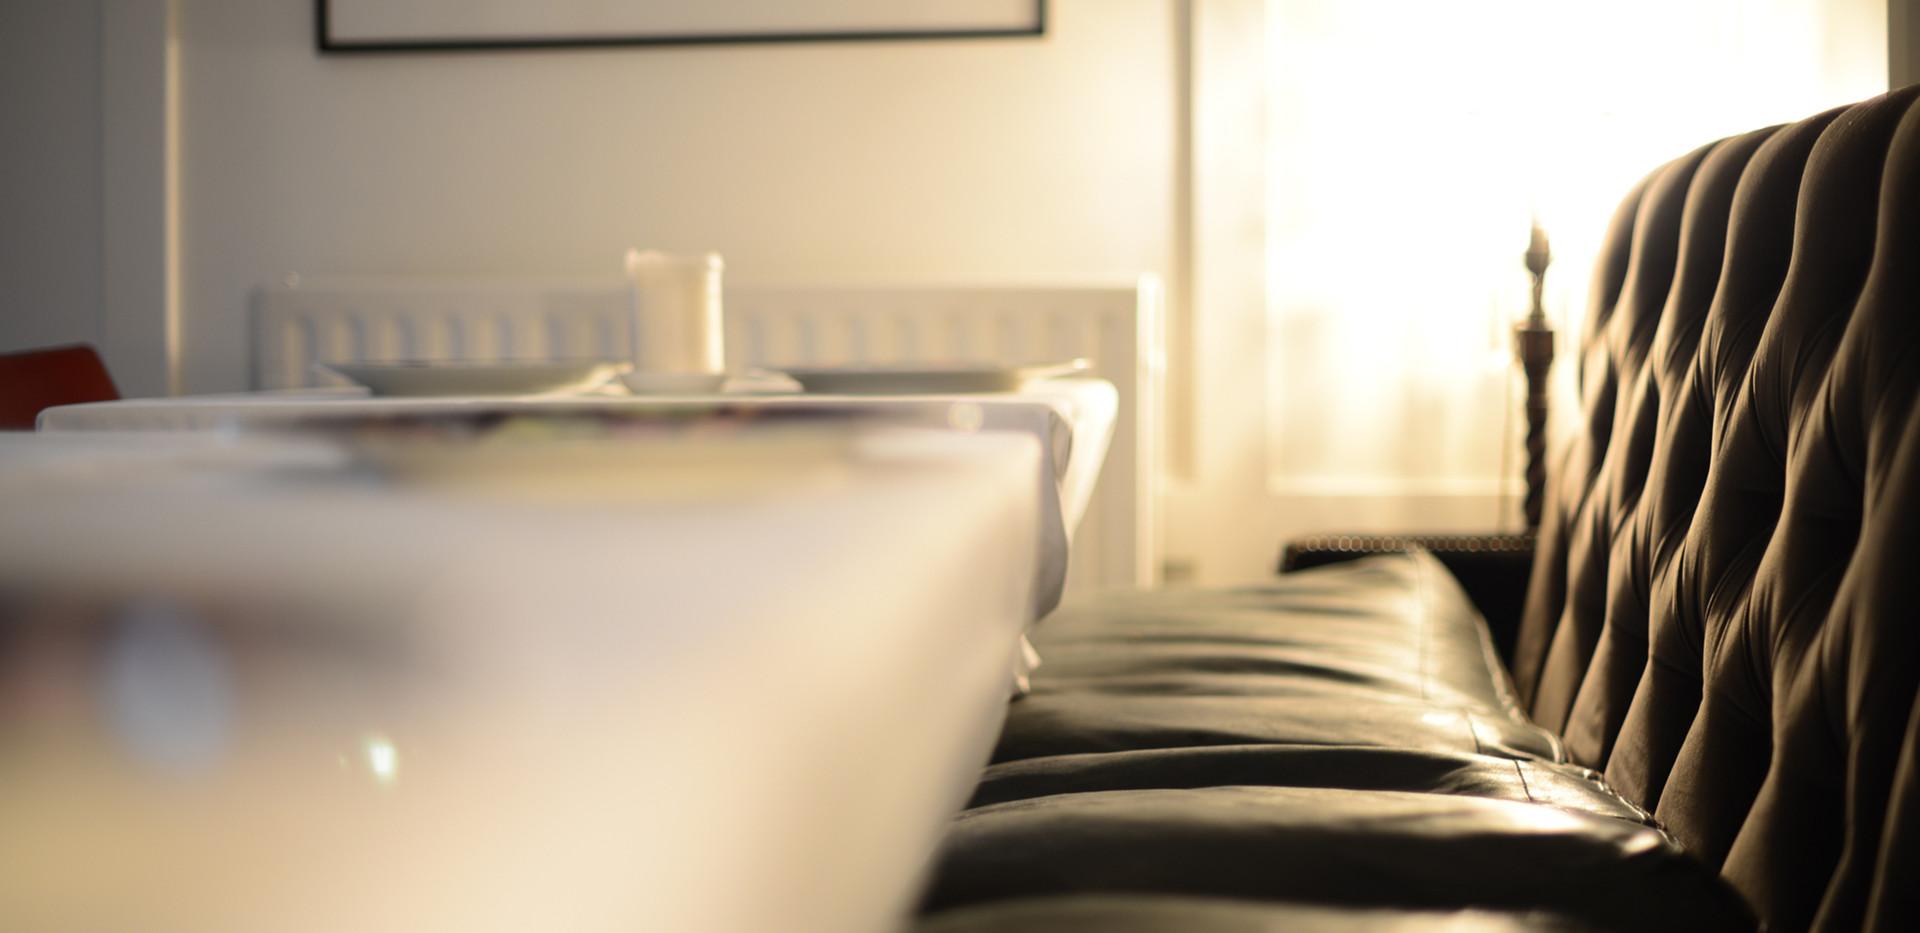 Monachyle Dining Room.jpg